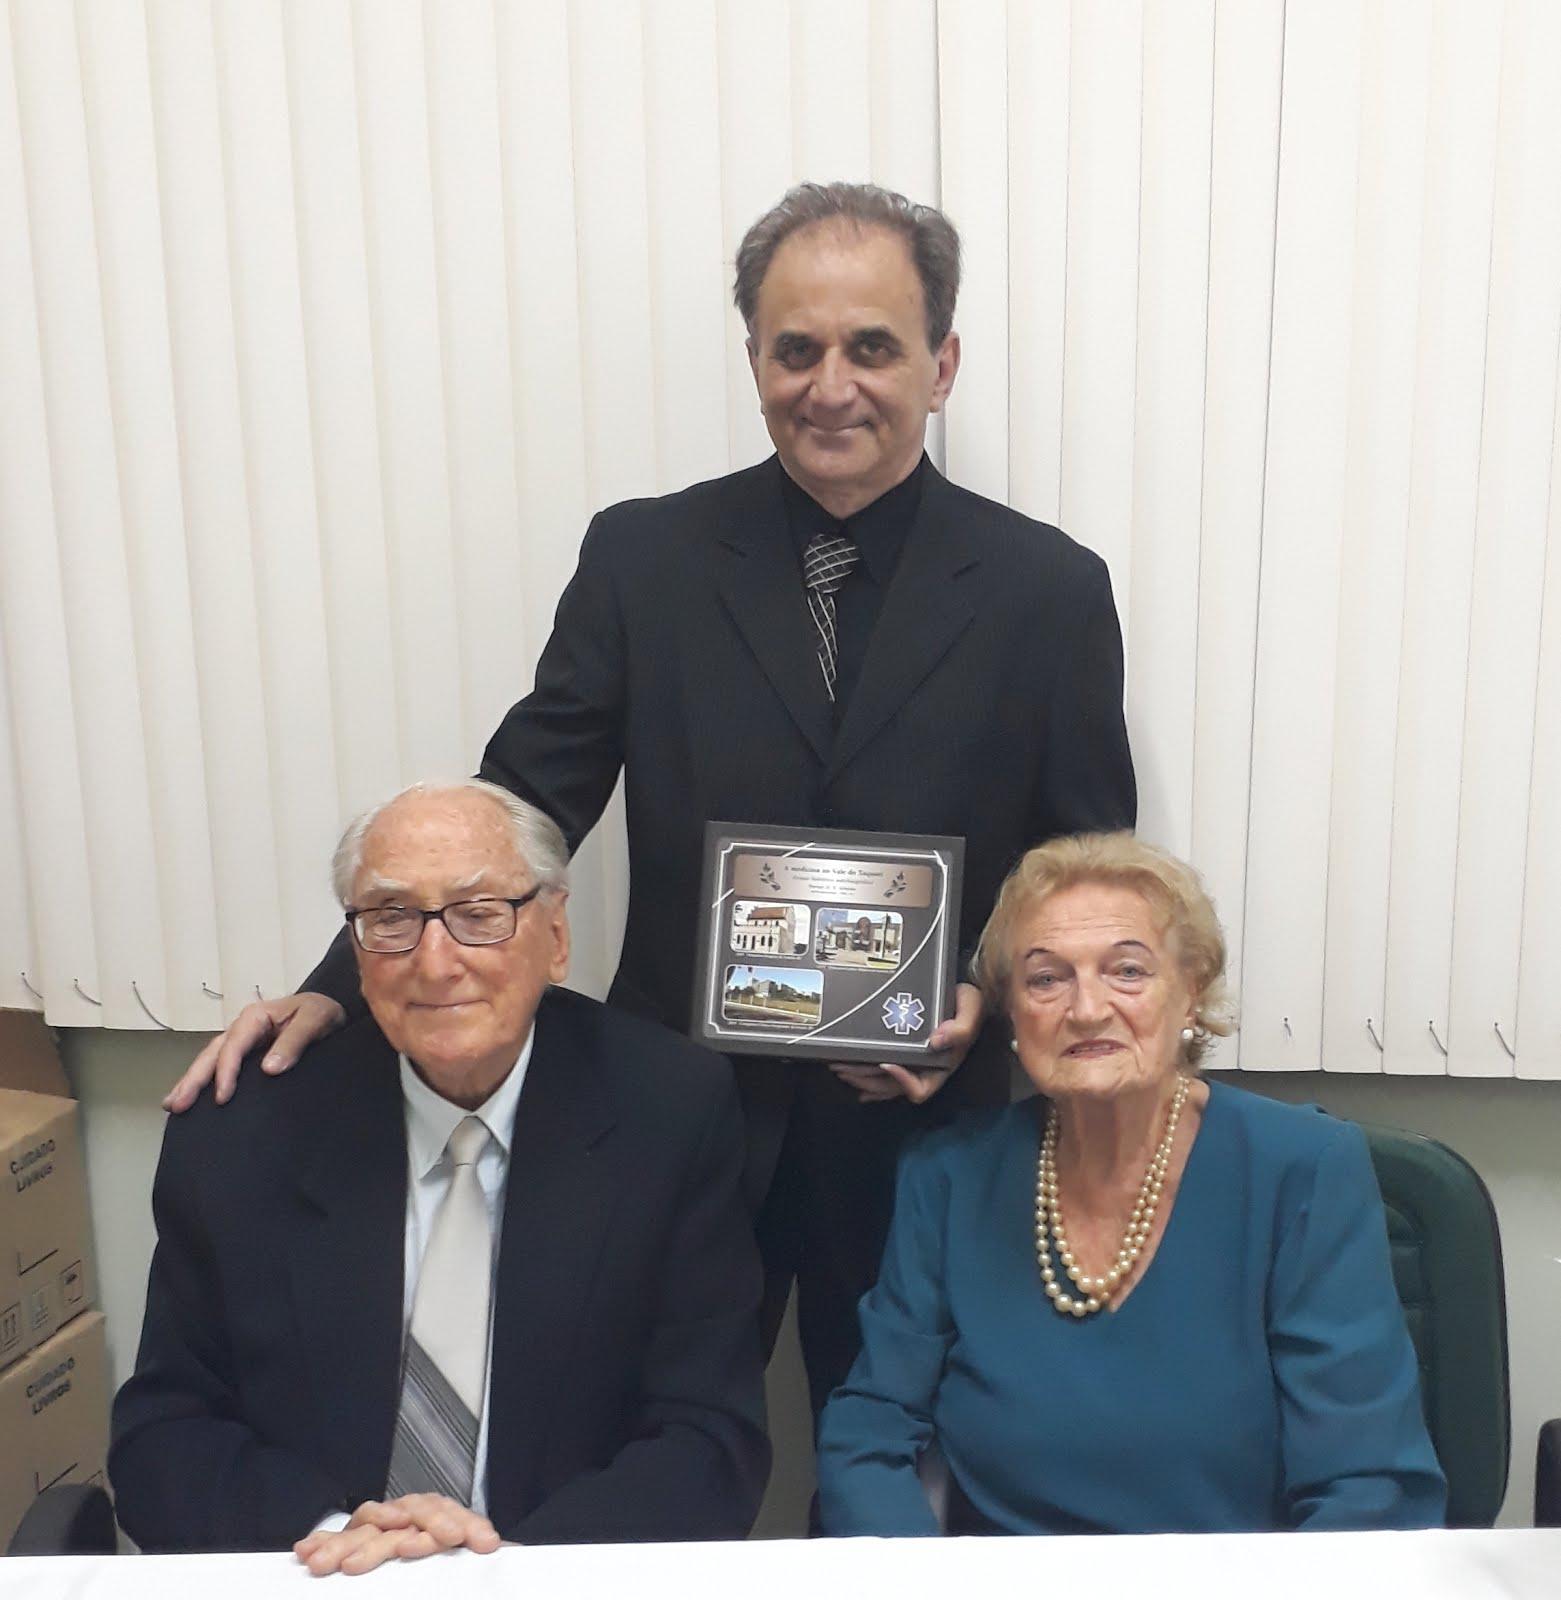 Airton Engster dos Santos, Dr. Werner Schinke e D Gisela Schinke